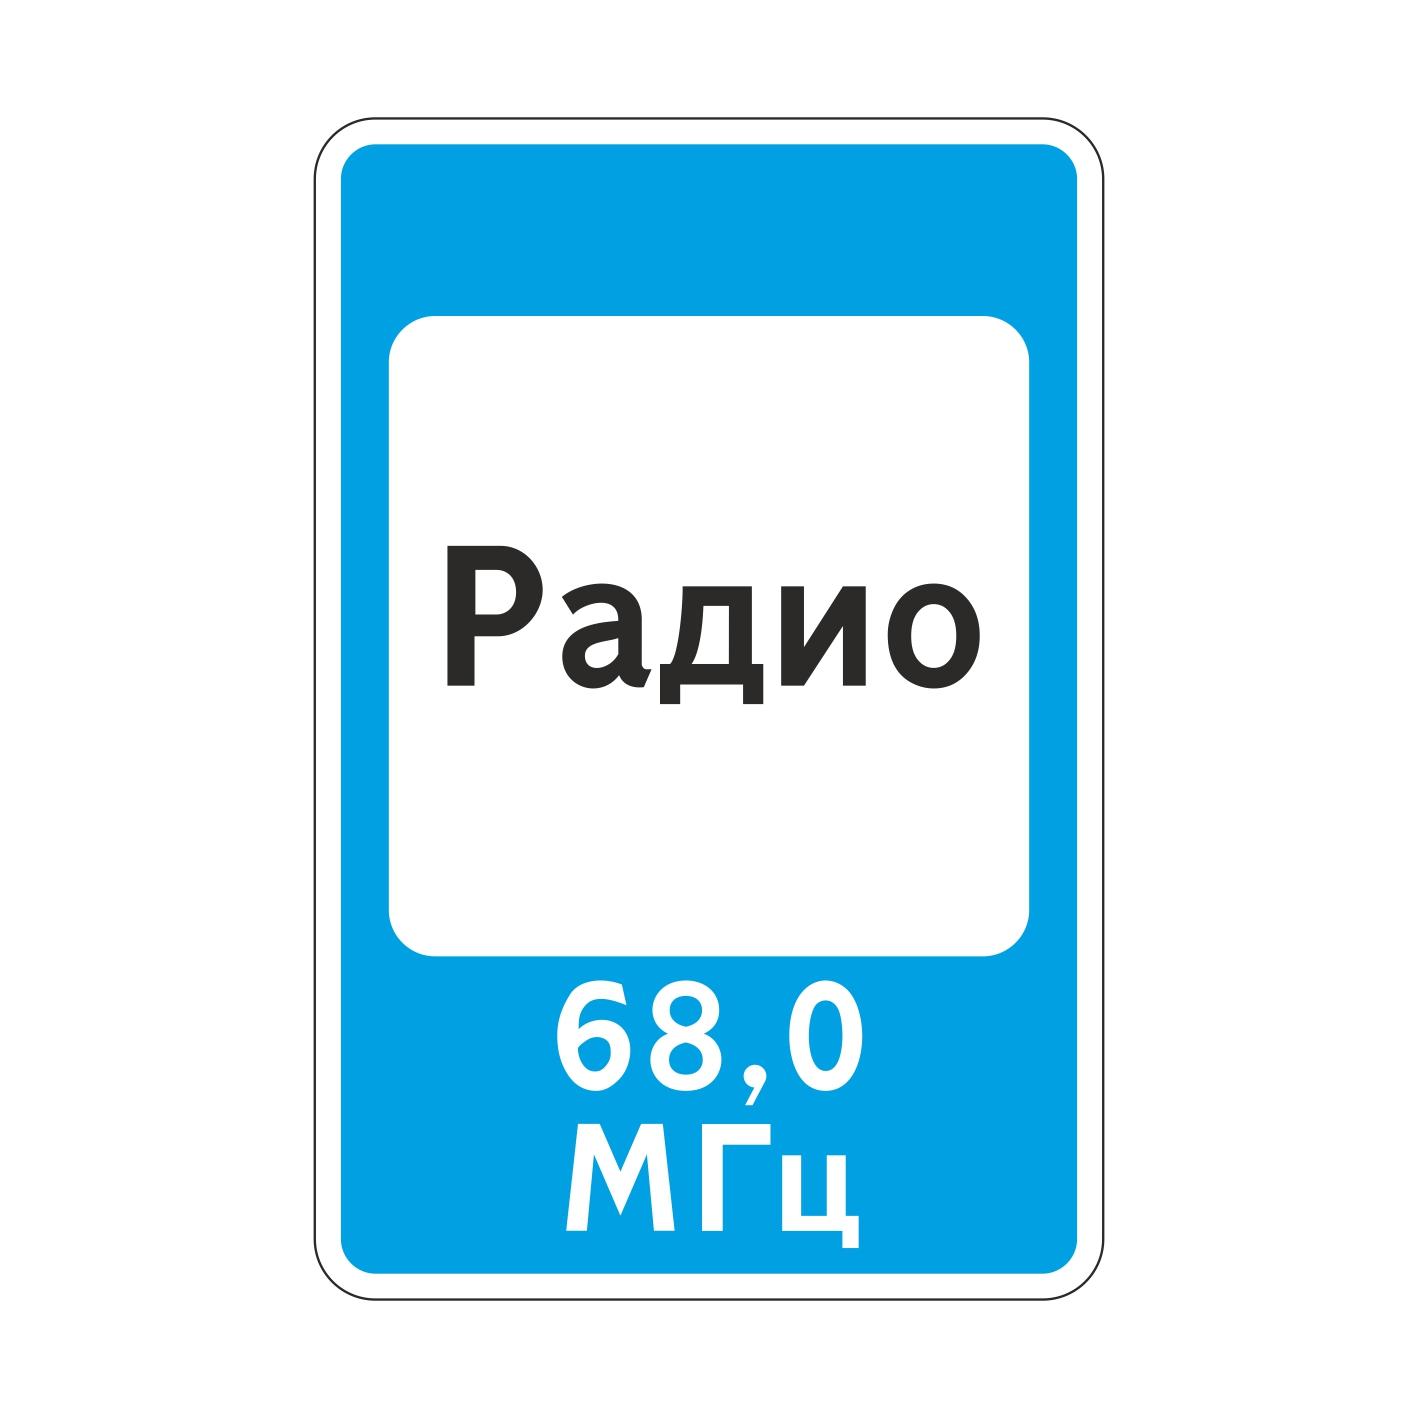 7.15 Зона приема радиостанции